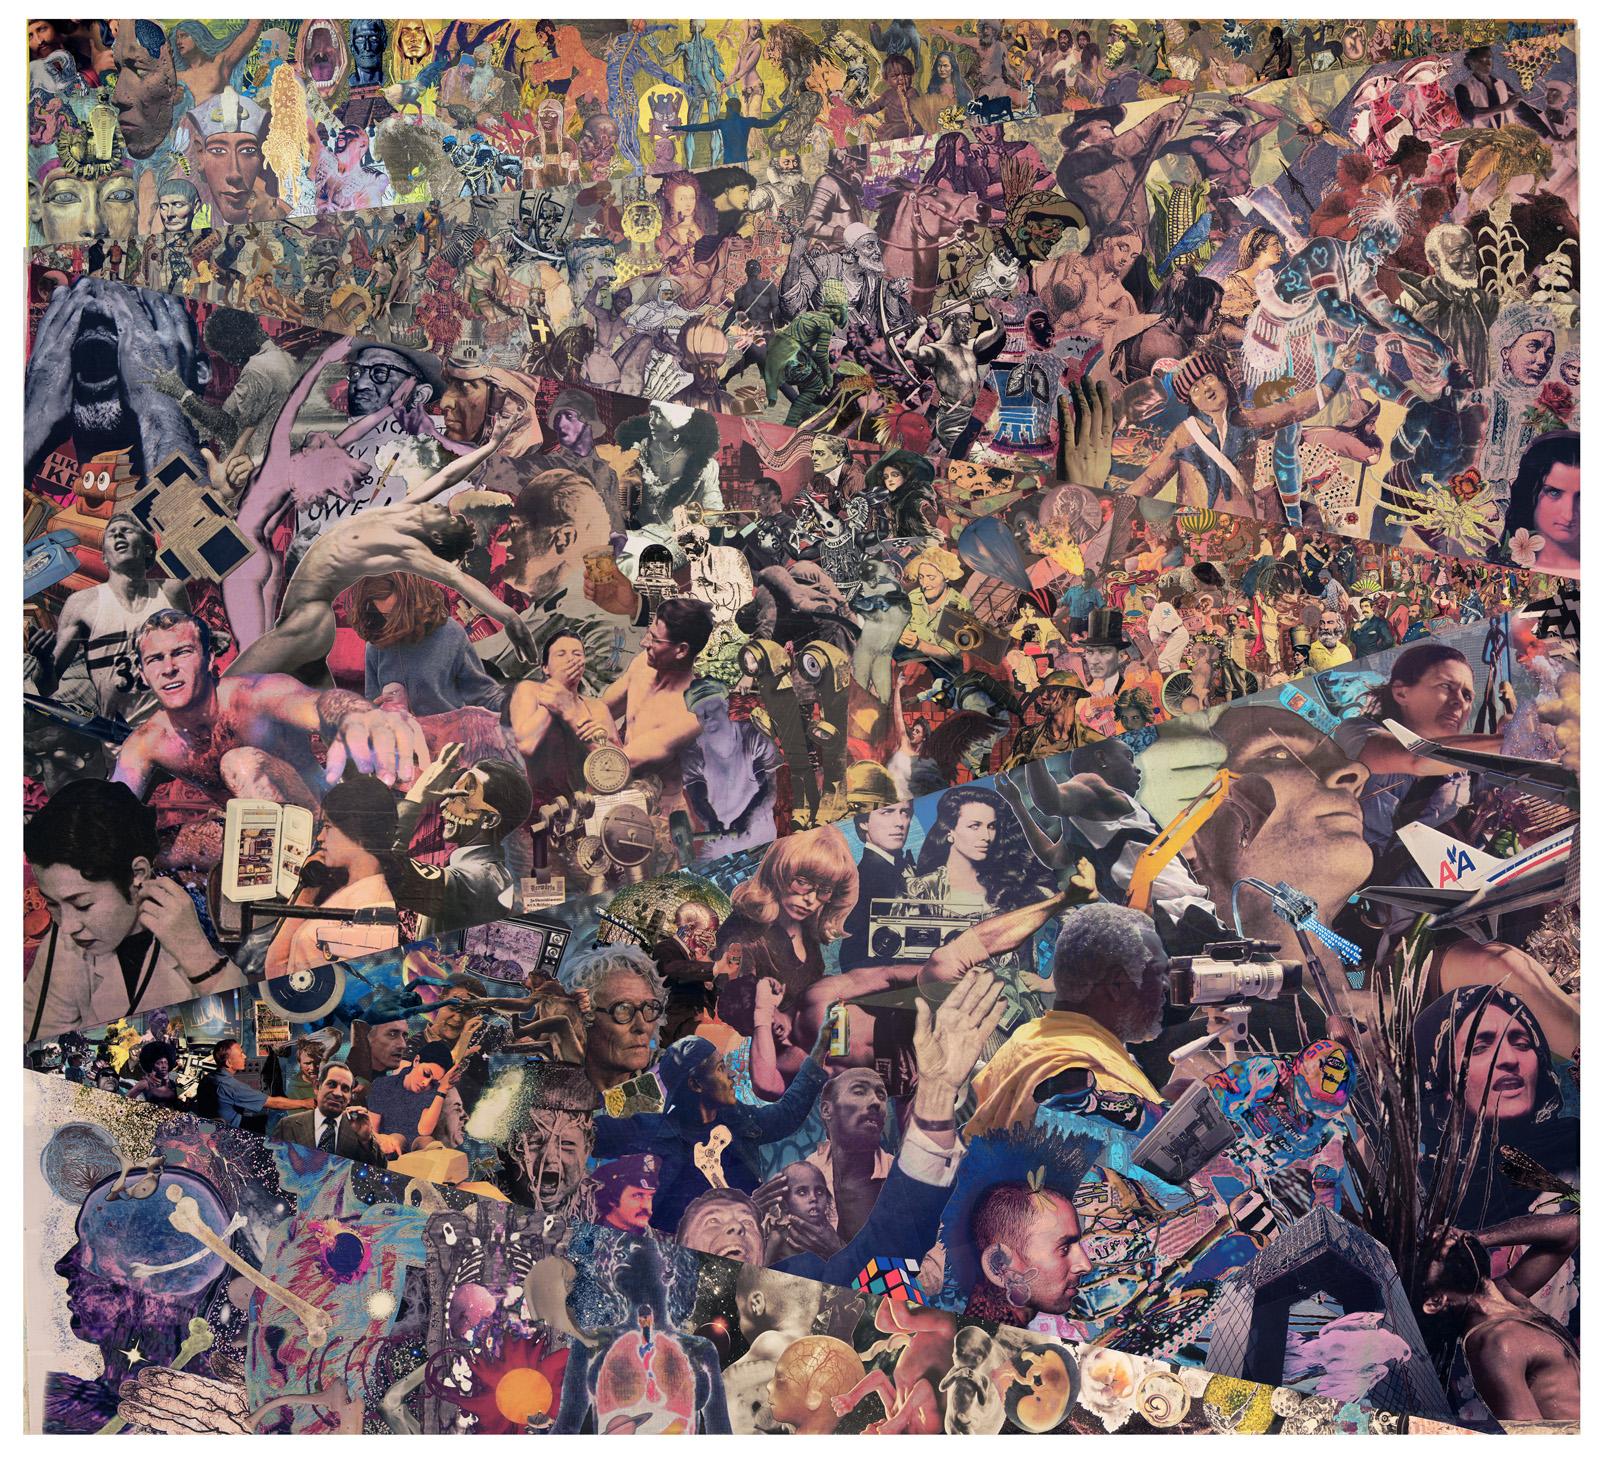 Aaron Morse | Timeline (Humanity), 2010-11